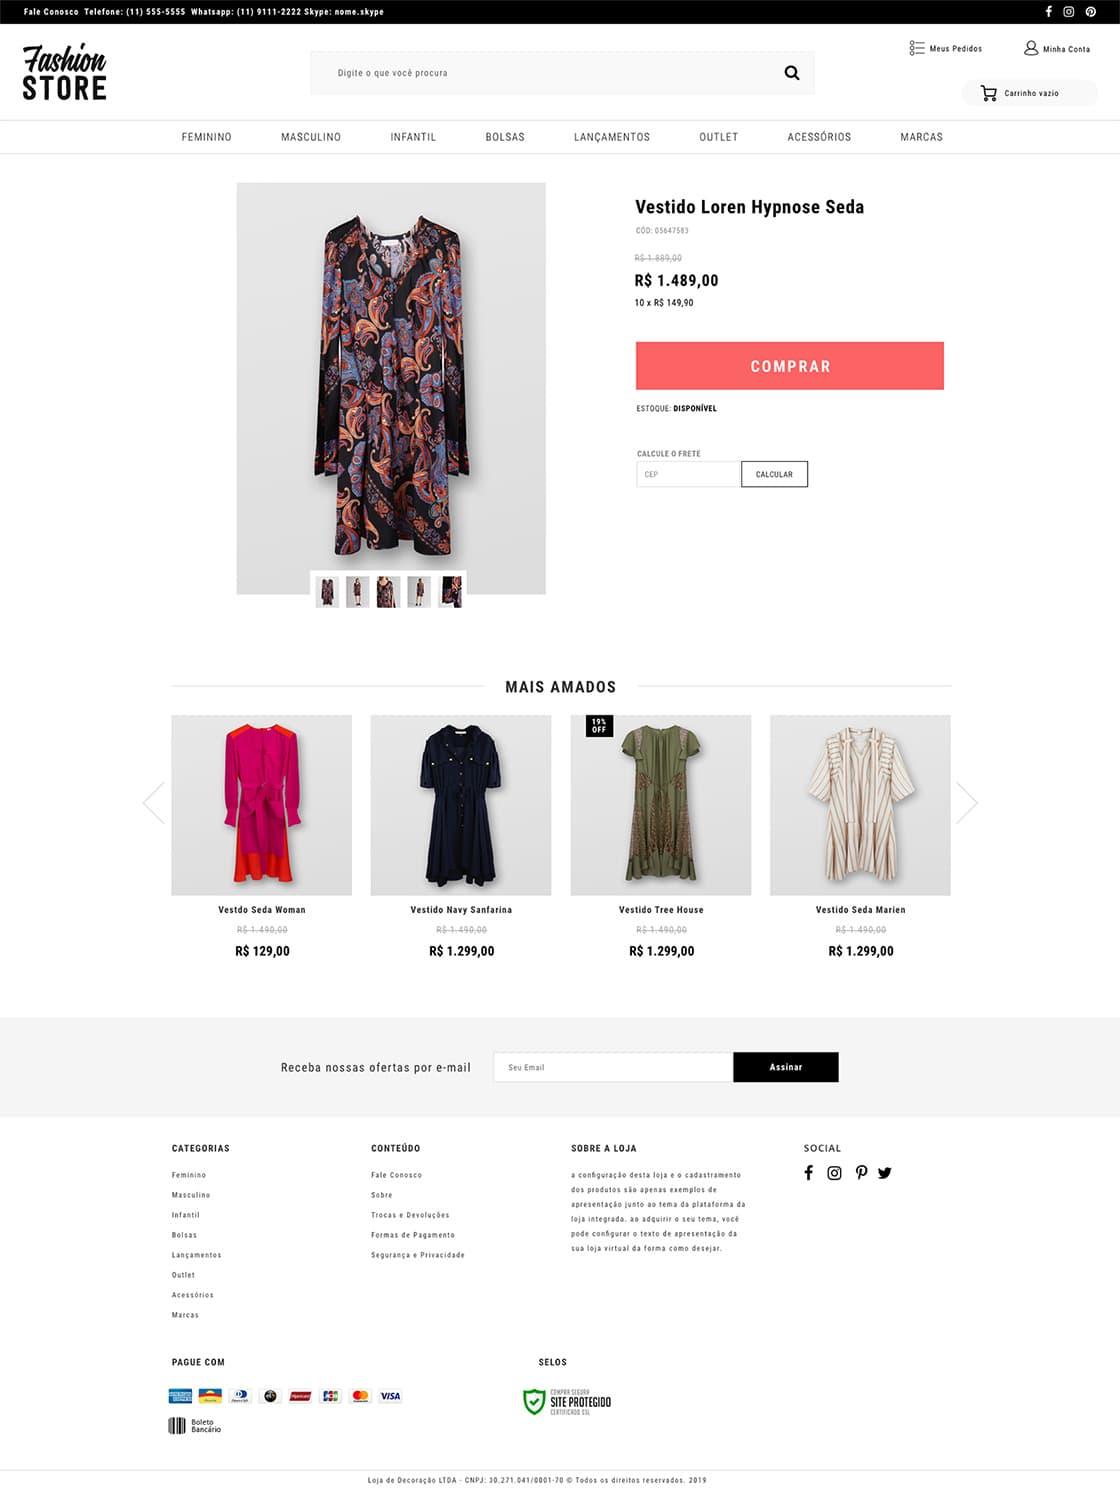 Fashion Store Moda Tema Loja Virtual Eshop